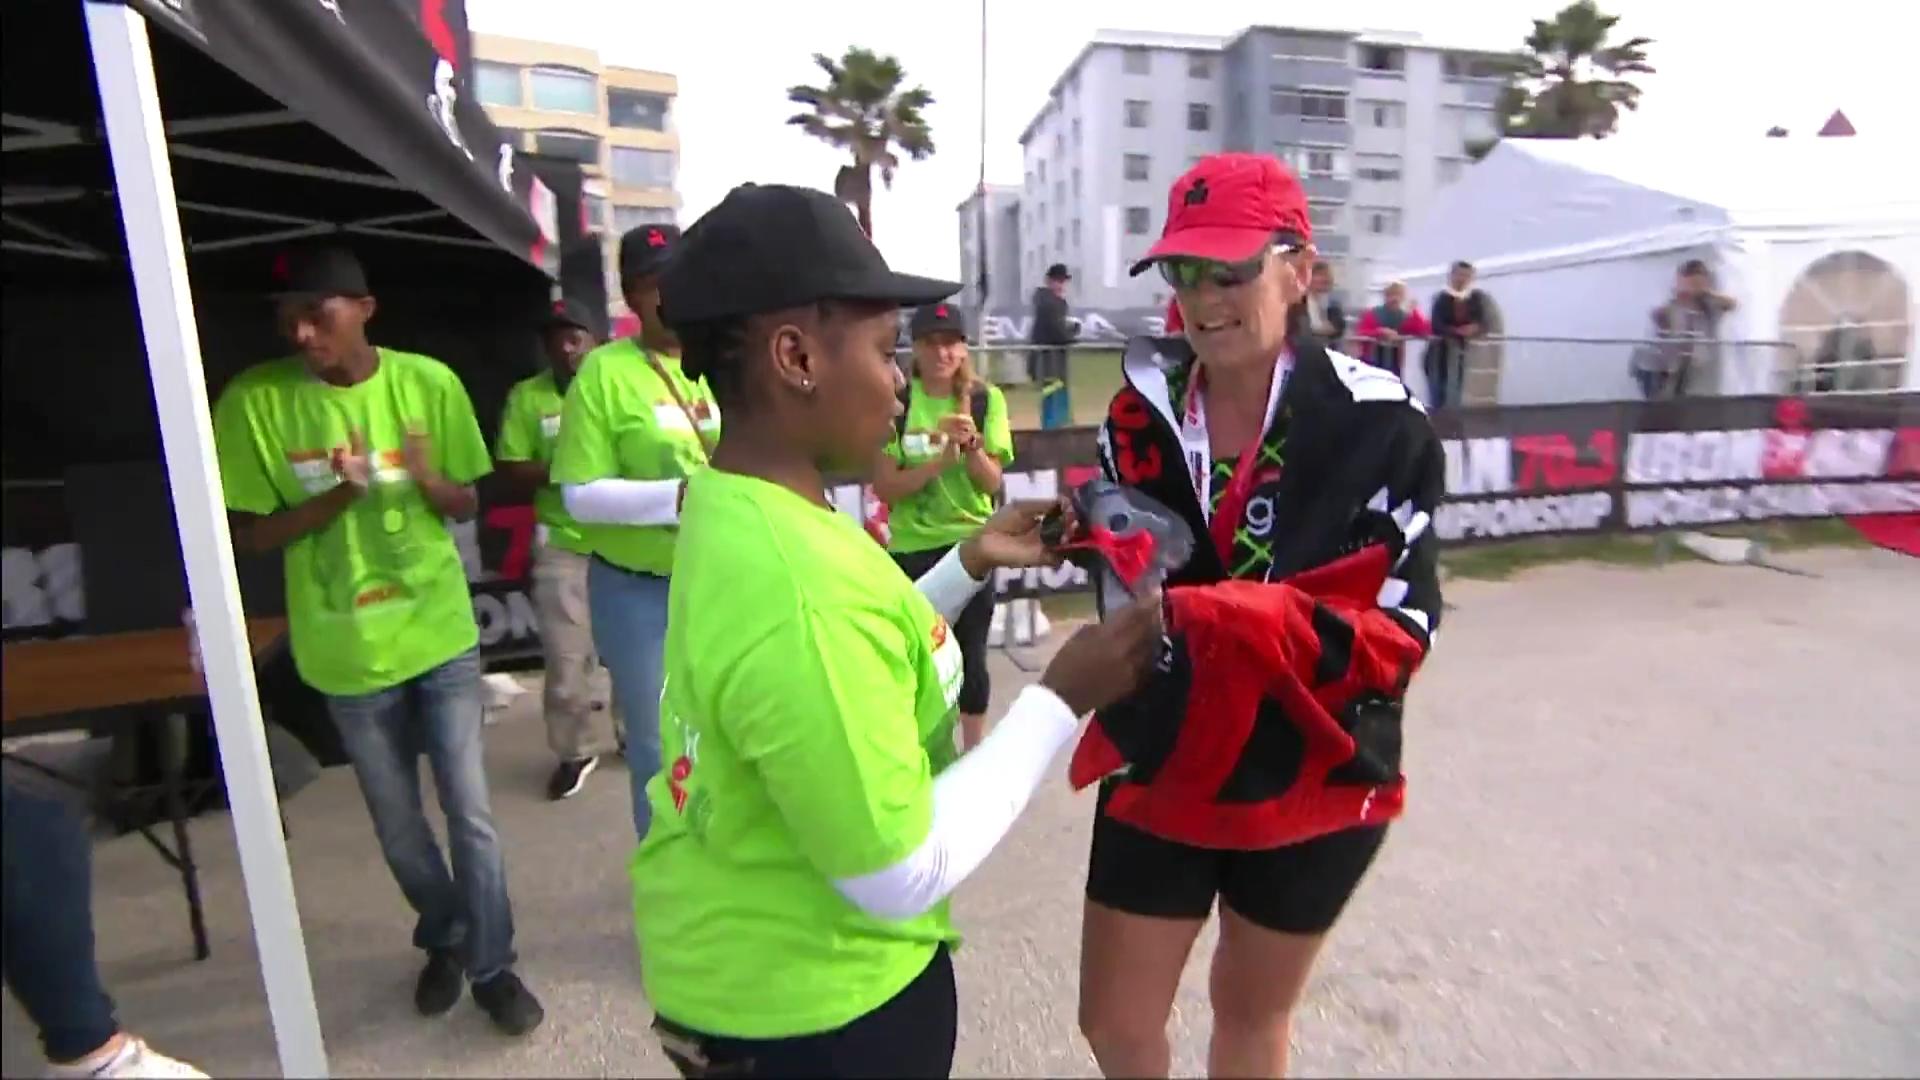 Melanie Cameron – Ironman World Championship 2018 21